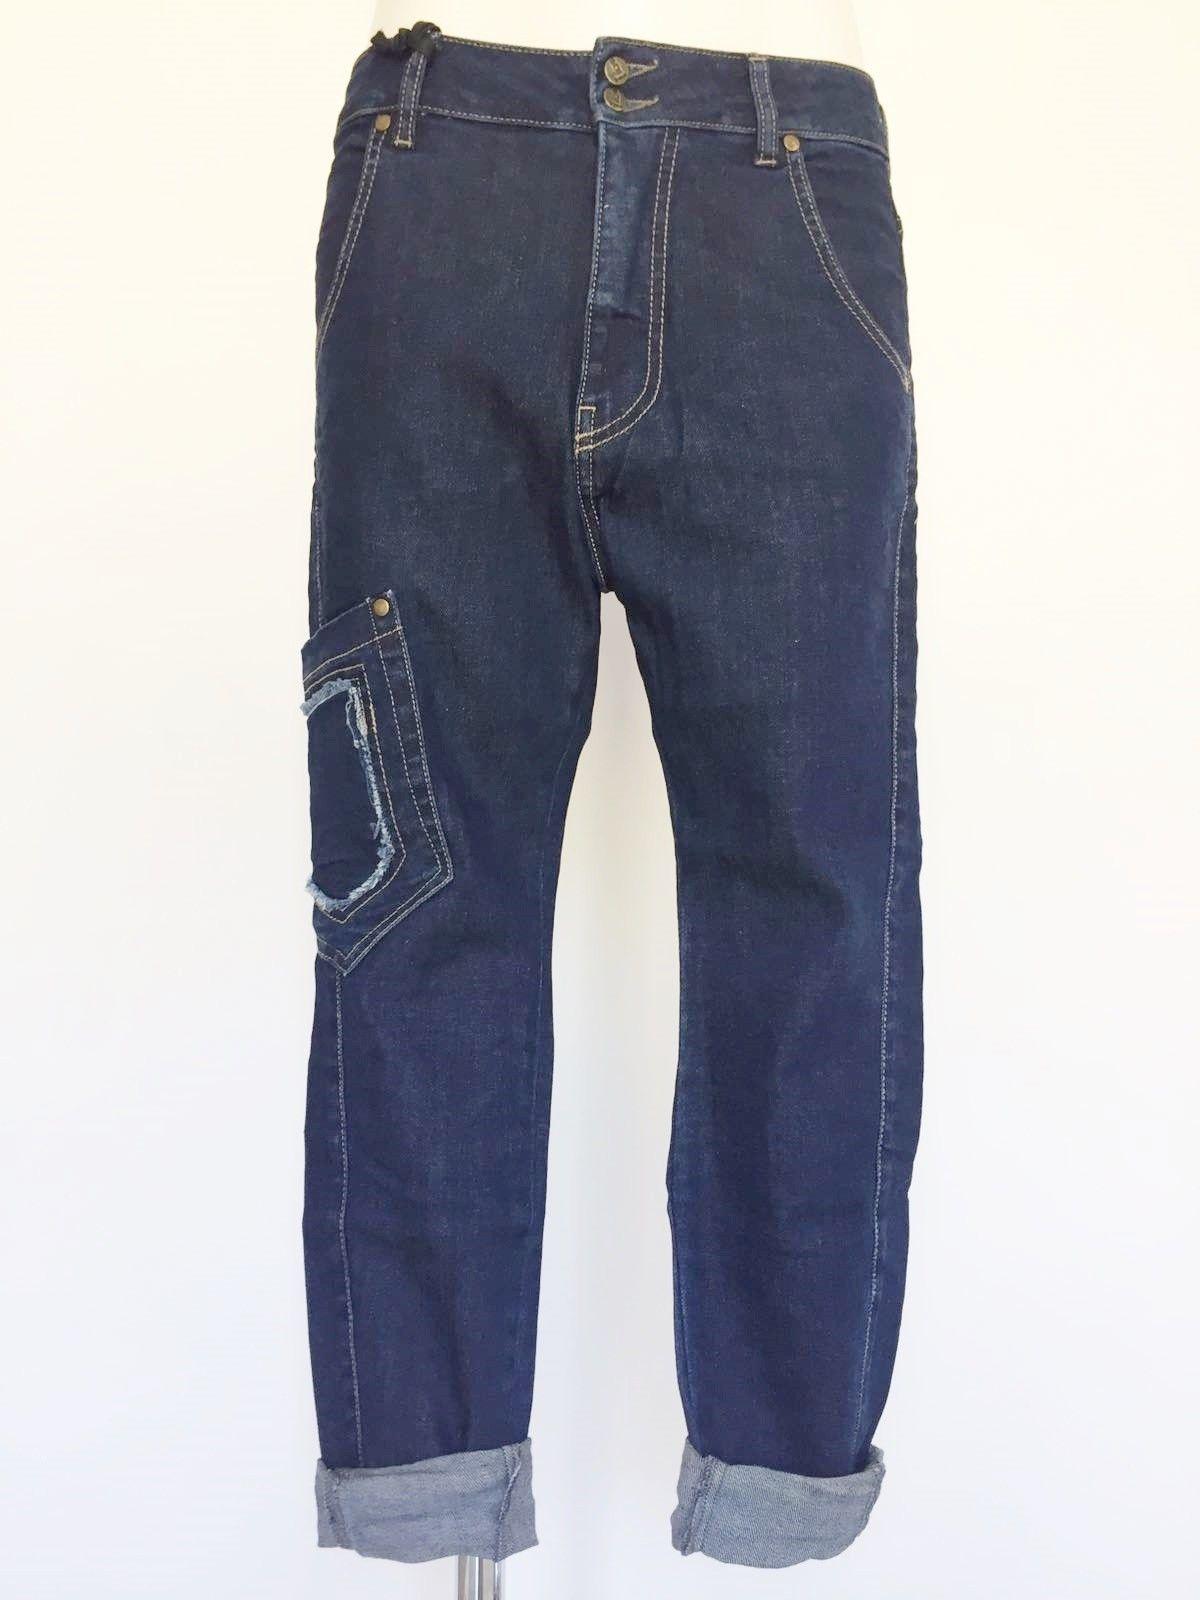 Jeans Sexy Woman mod.Boyfriend tasca laterale Cod.P414900